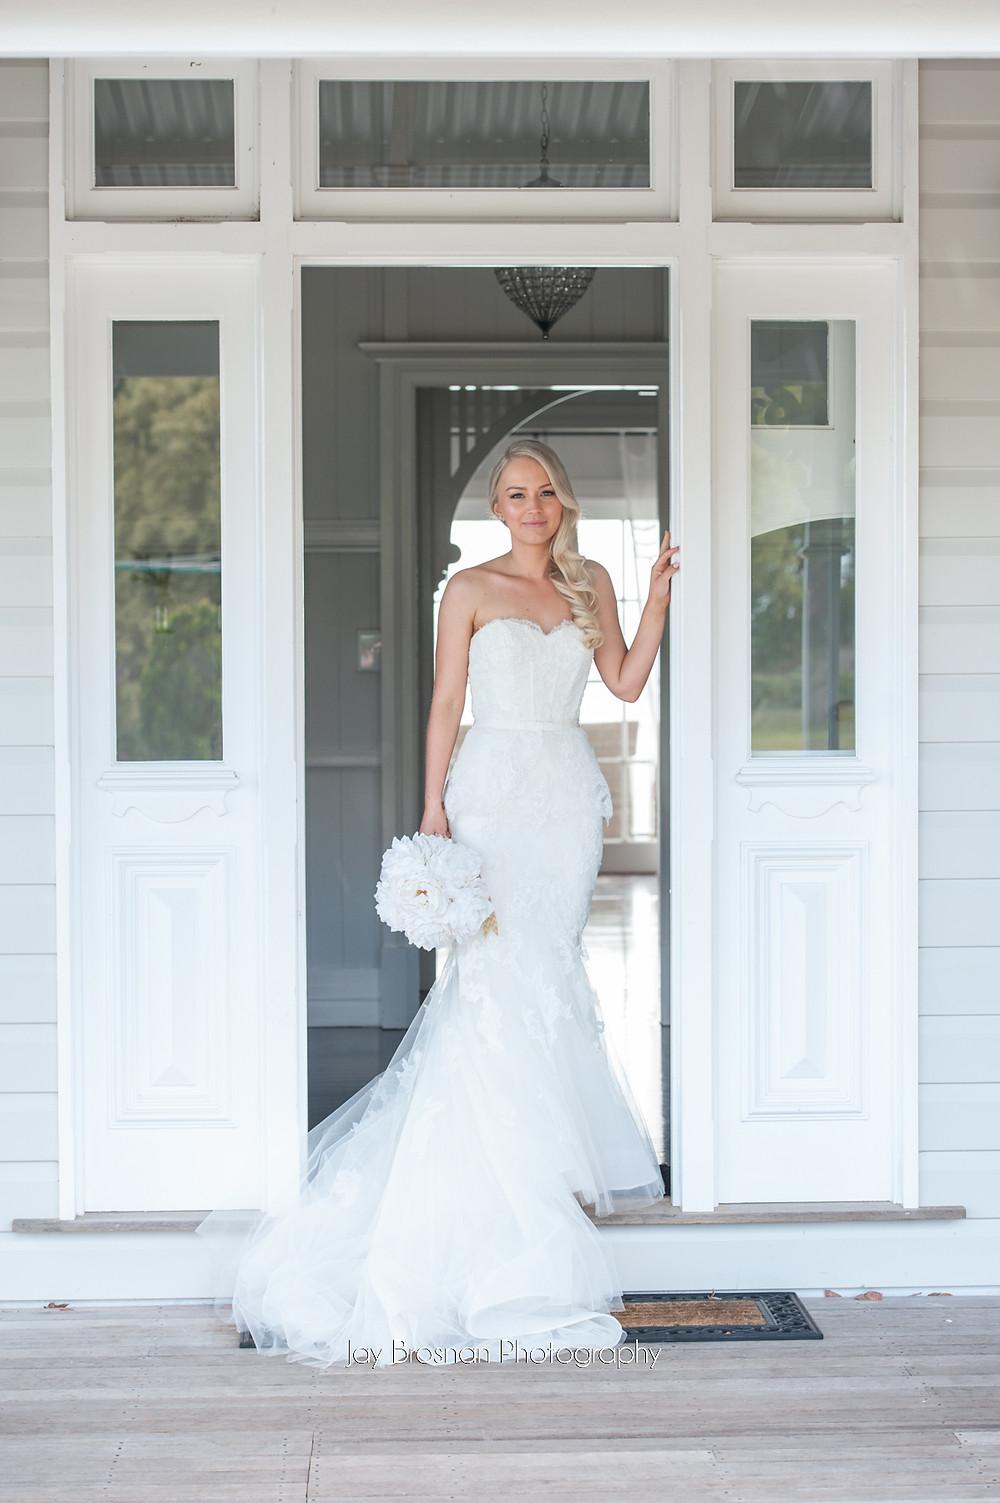 Jay Brosnan Photography | Sunshine Coast Wedding Photographer | Brisbane Wedding Photographer | Wedding Photographer | Portrait Photographer | Engagement Photographer | Wedding | Photographer | Weddings at Tiffanys | Maleny Wedding | Hinterland Wedding | Wedding Dress